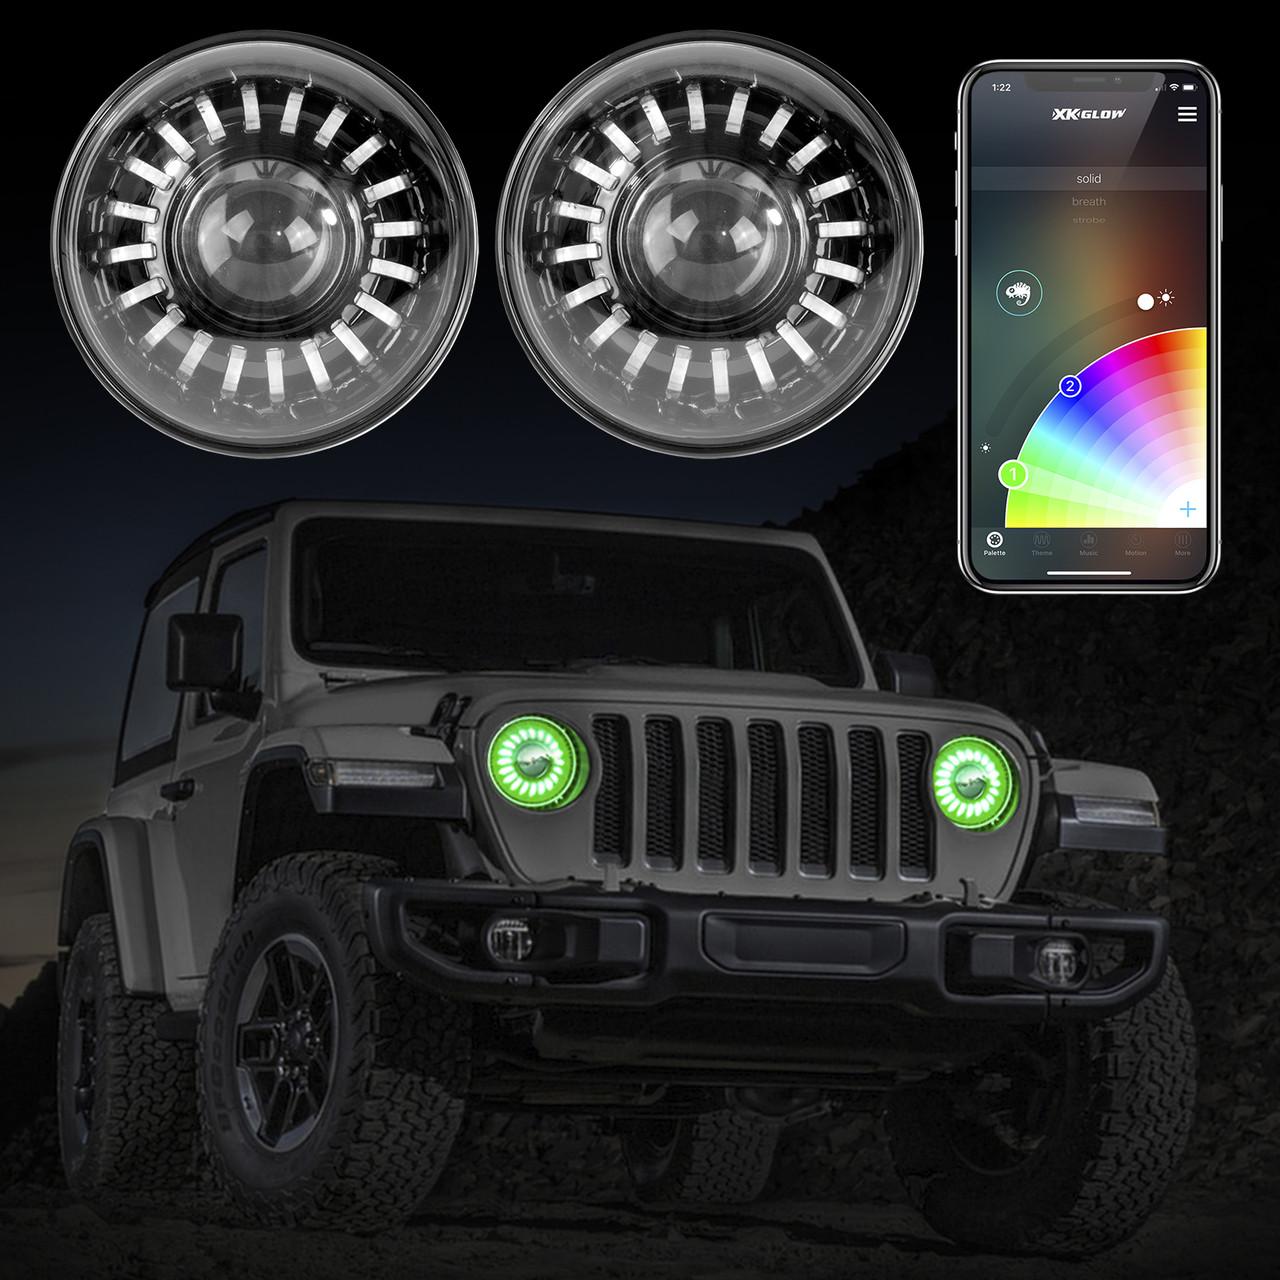 Jeep Wrangler Led Headlights >> 7 Led Headlight Kit For Jeep Xkchrome Smartphone App